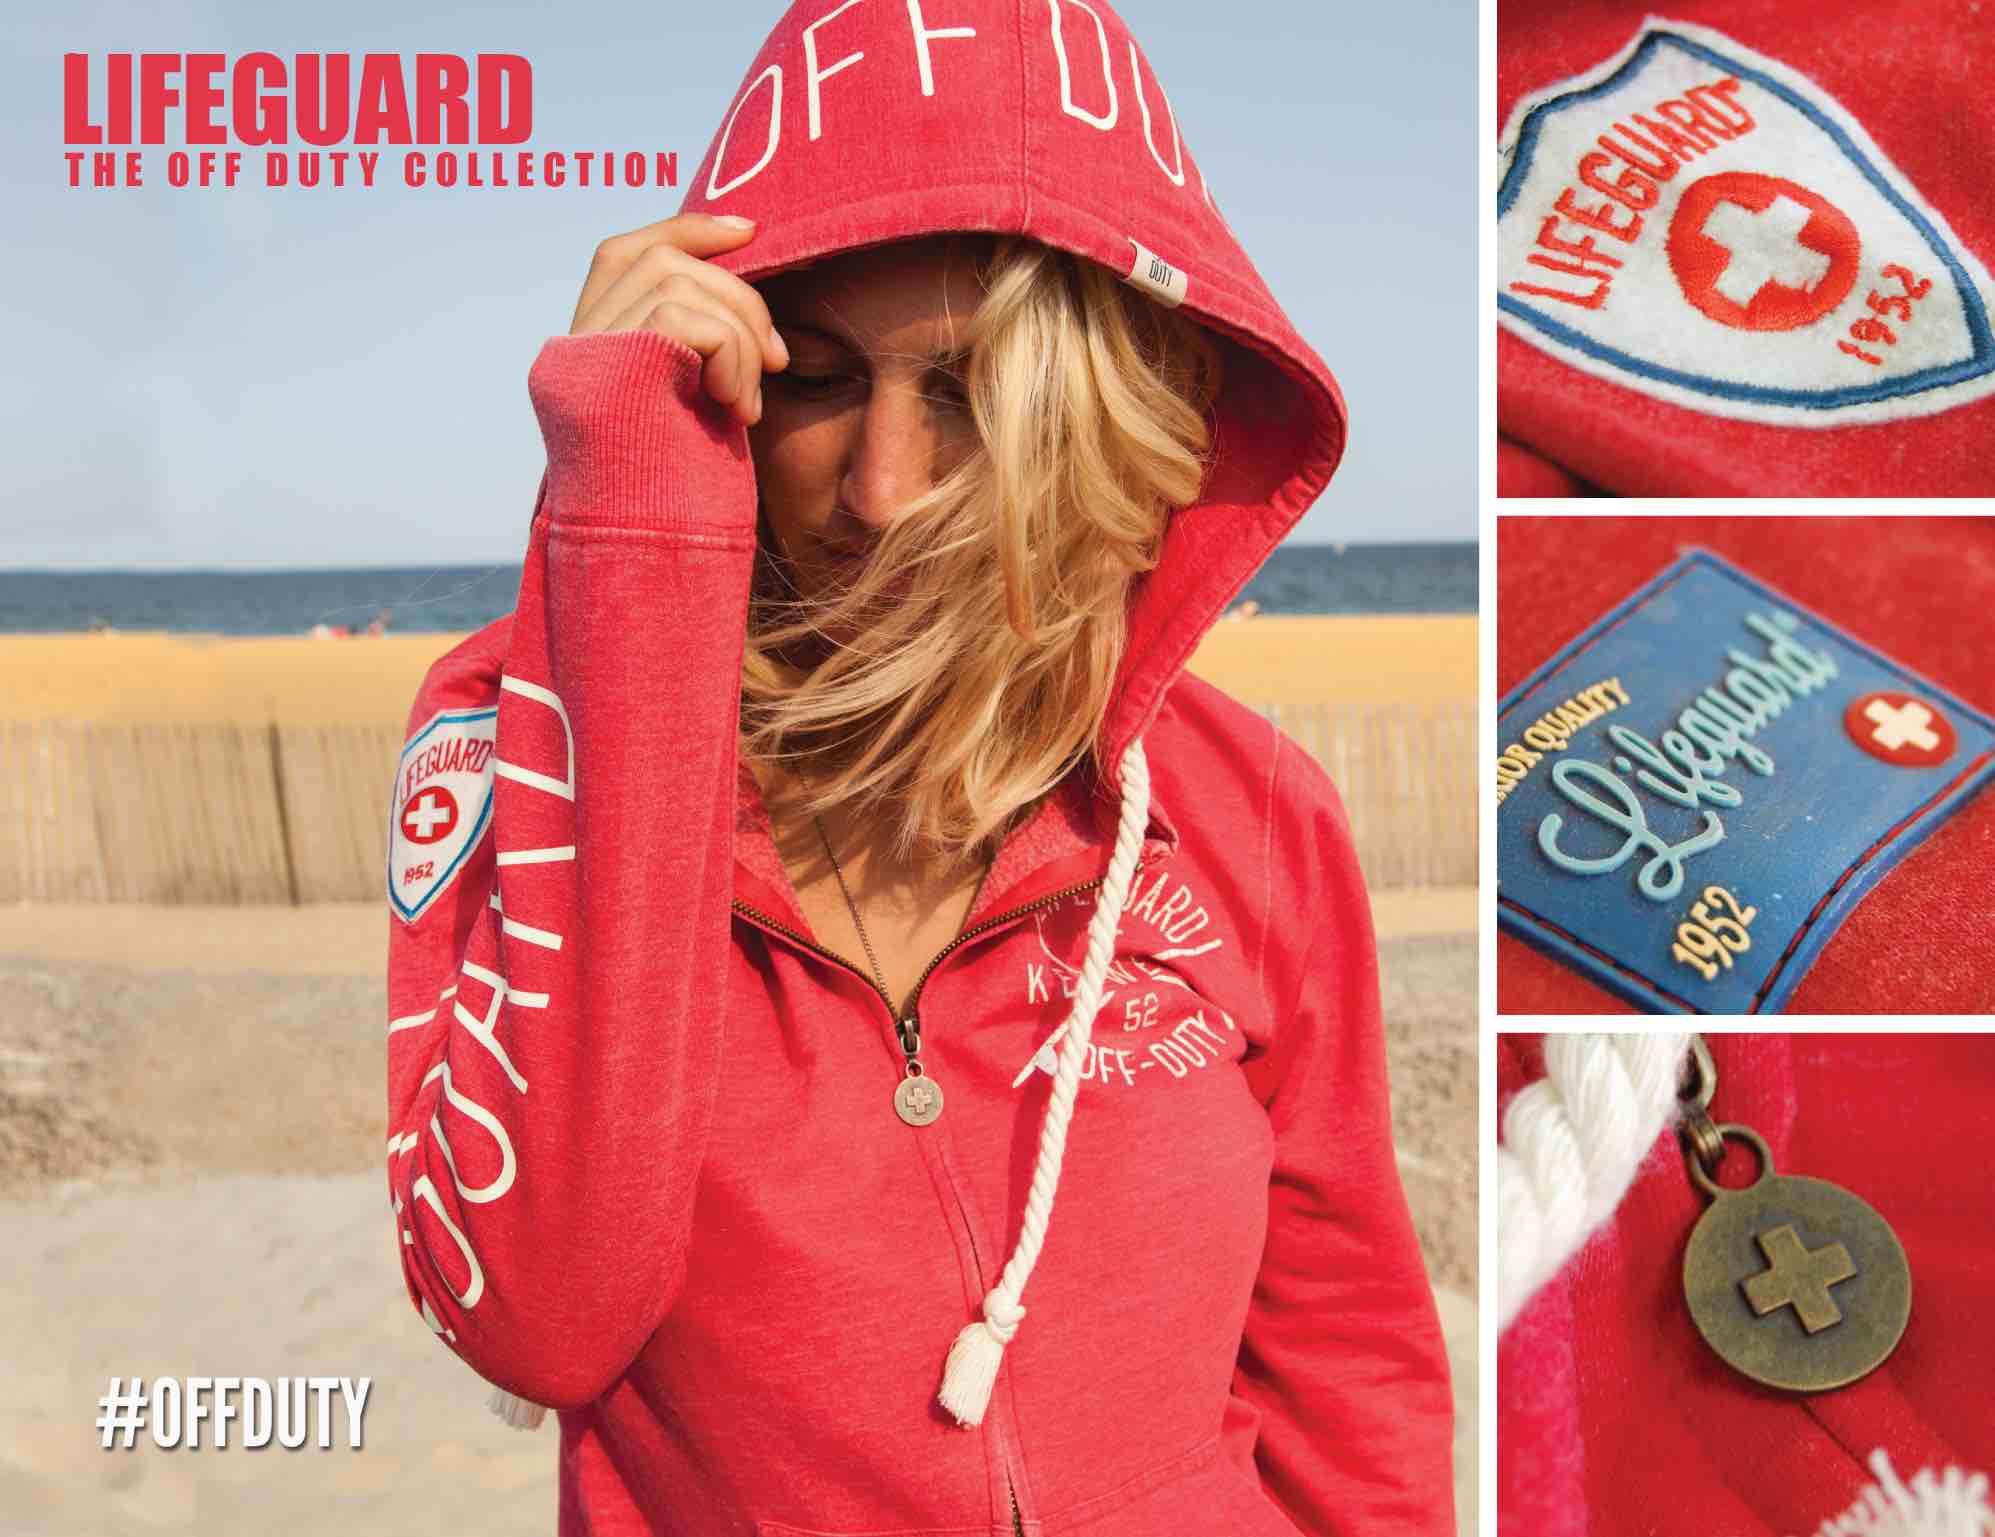 Off duty ladies Sweatpant, Sweatshirts, Beach Shorts | Lifeguard